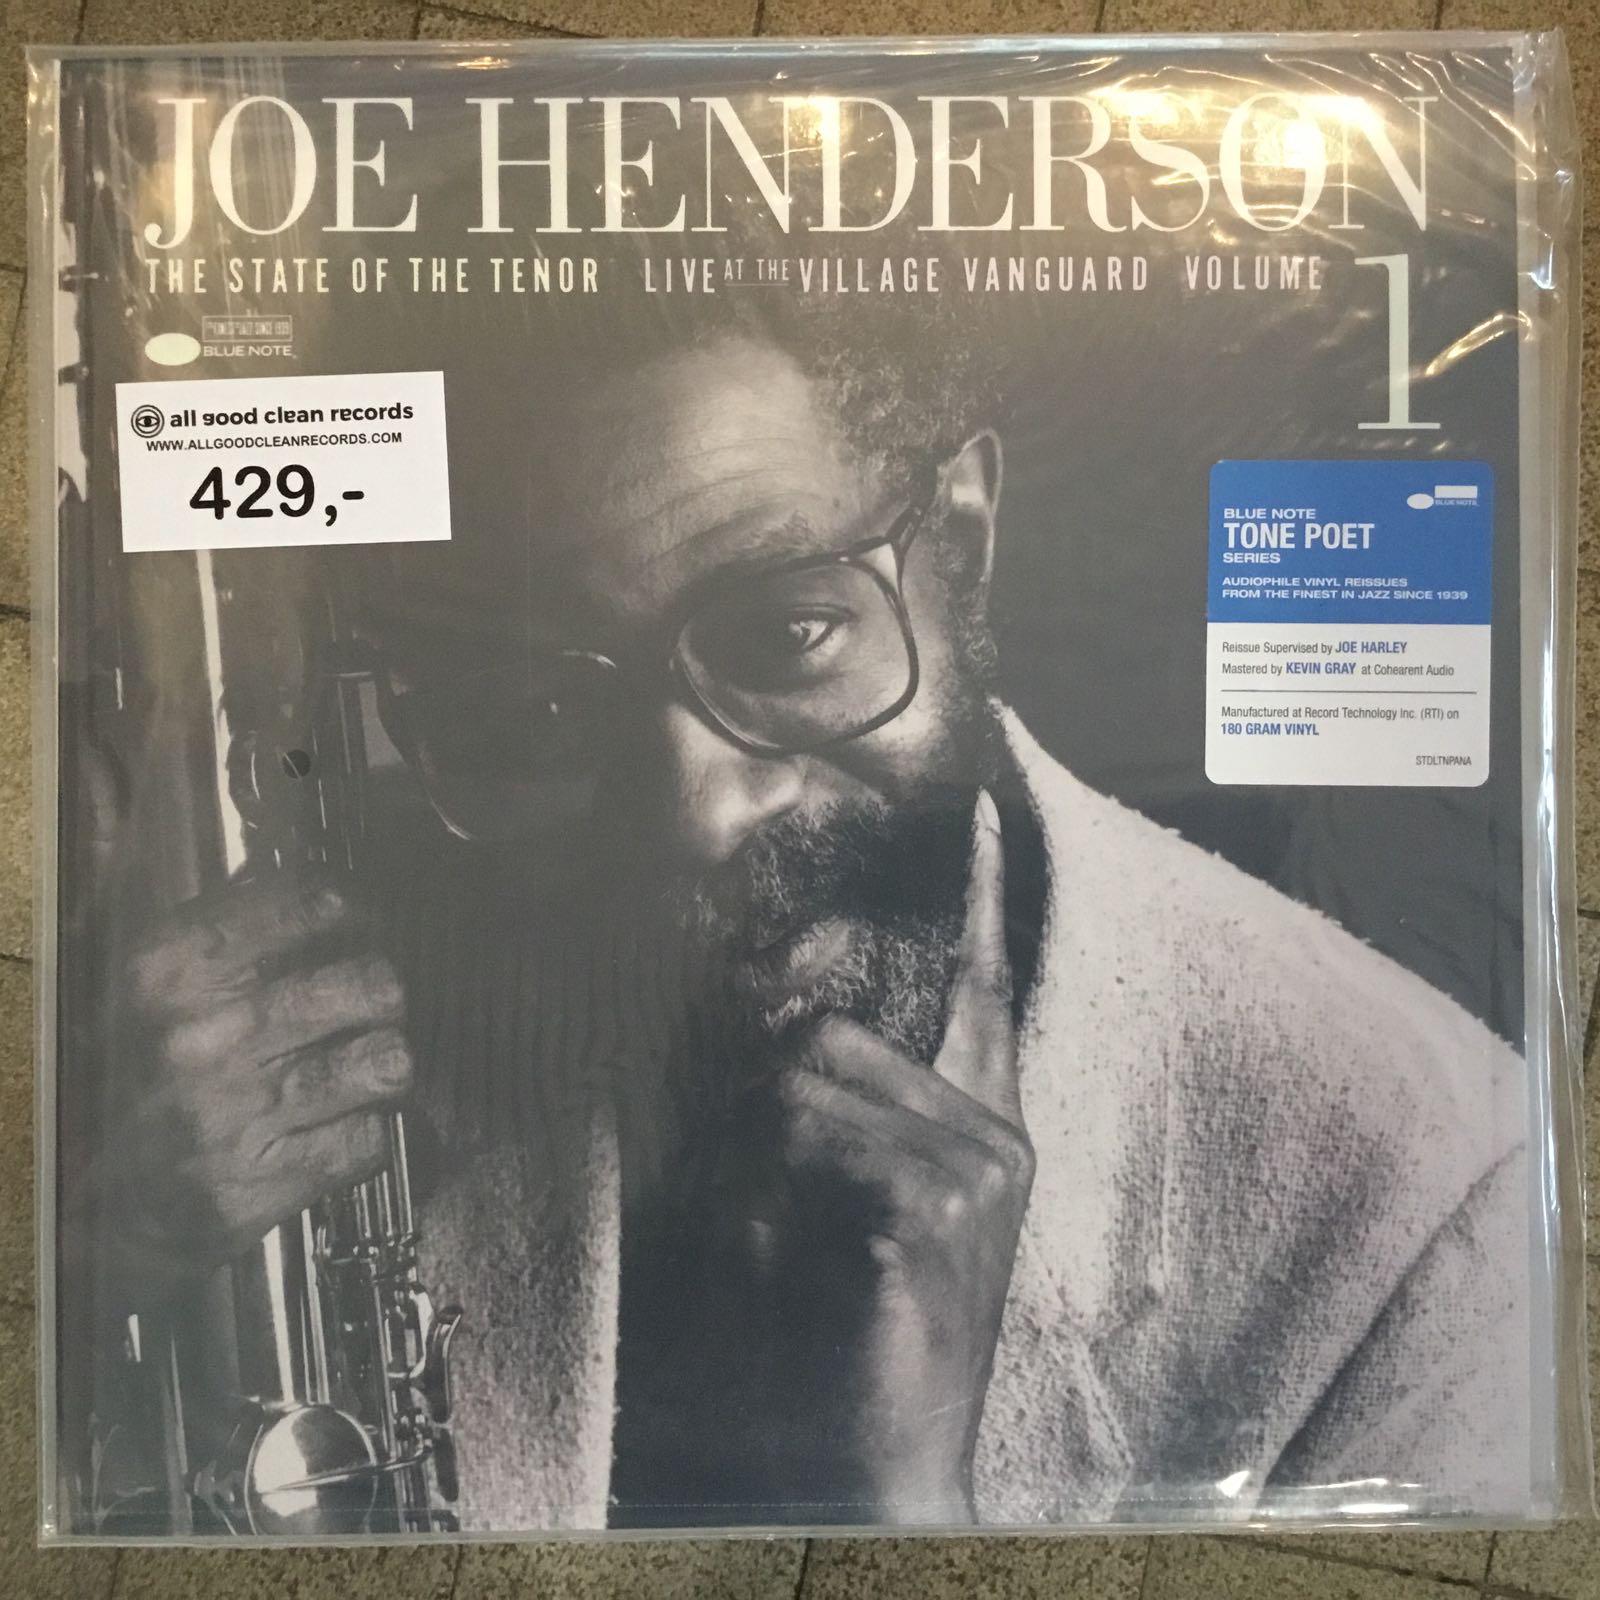 Joe Henderson - State Of The Tenor / Vol. 1 / Live At The Village Vanguard /1985 [LP]